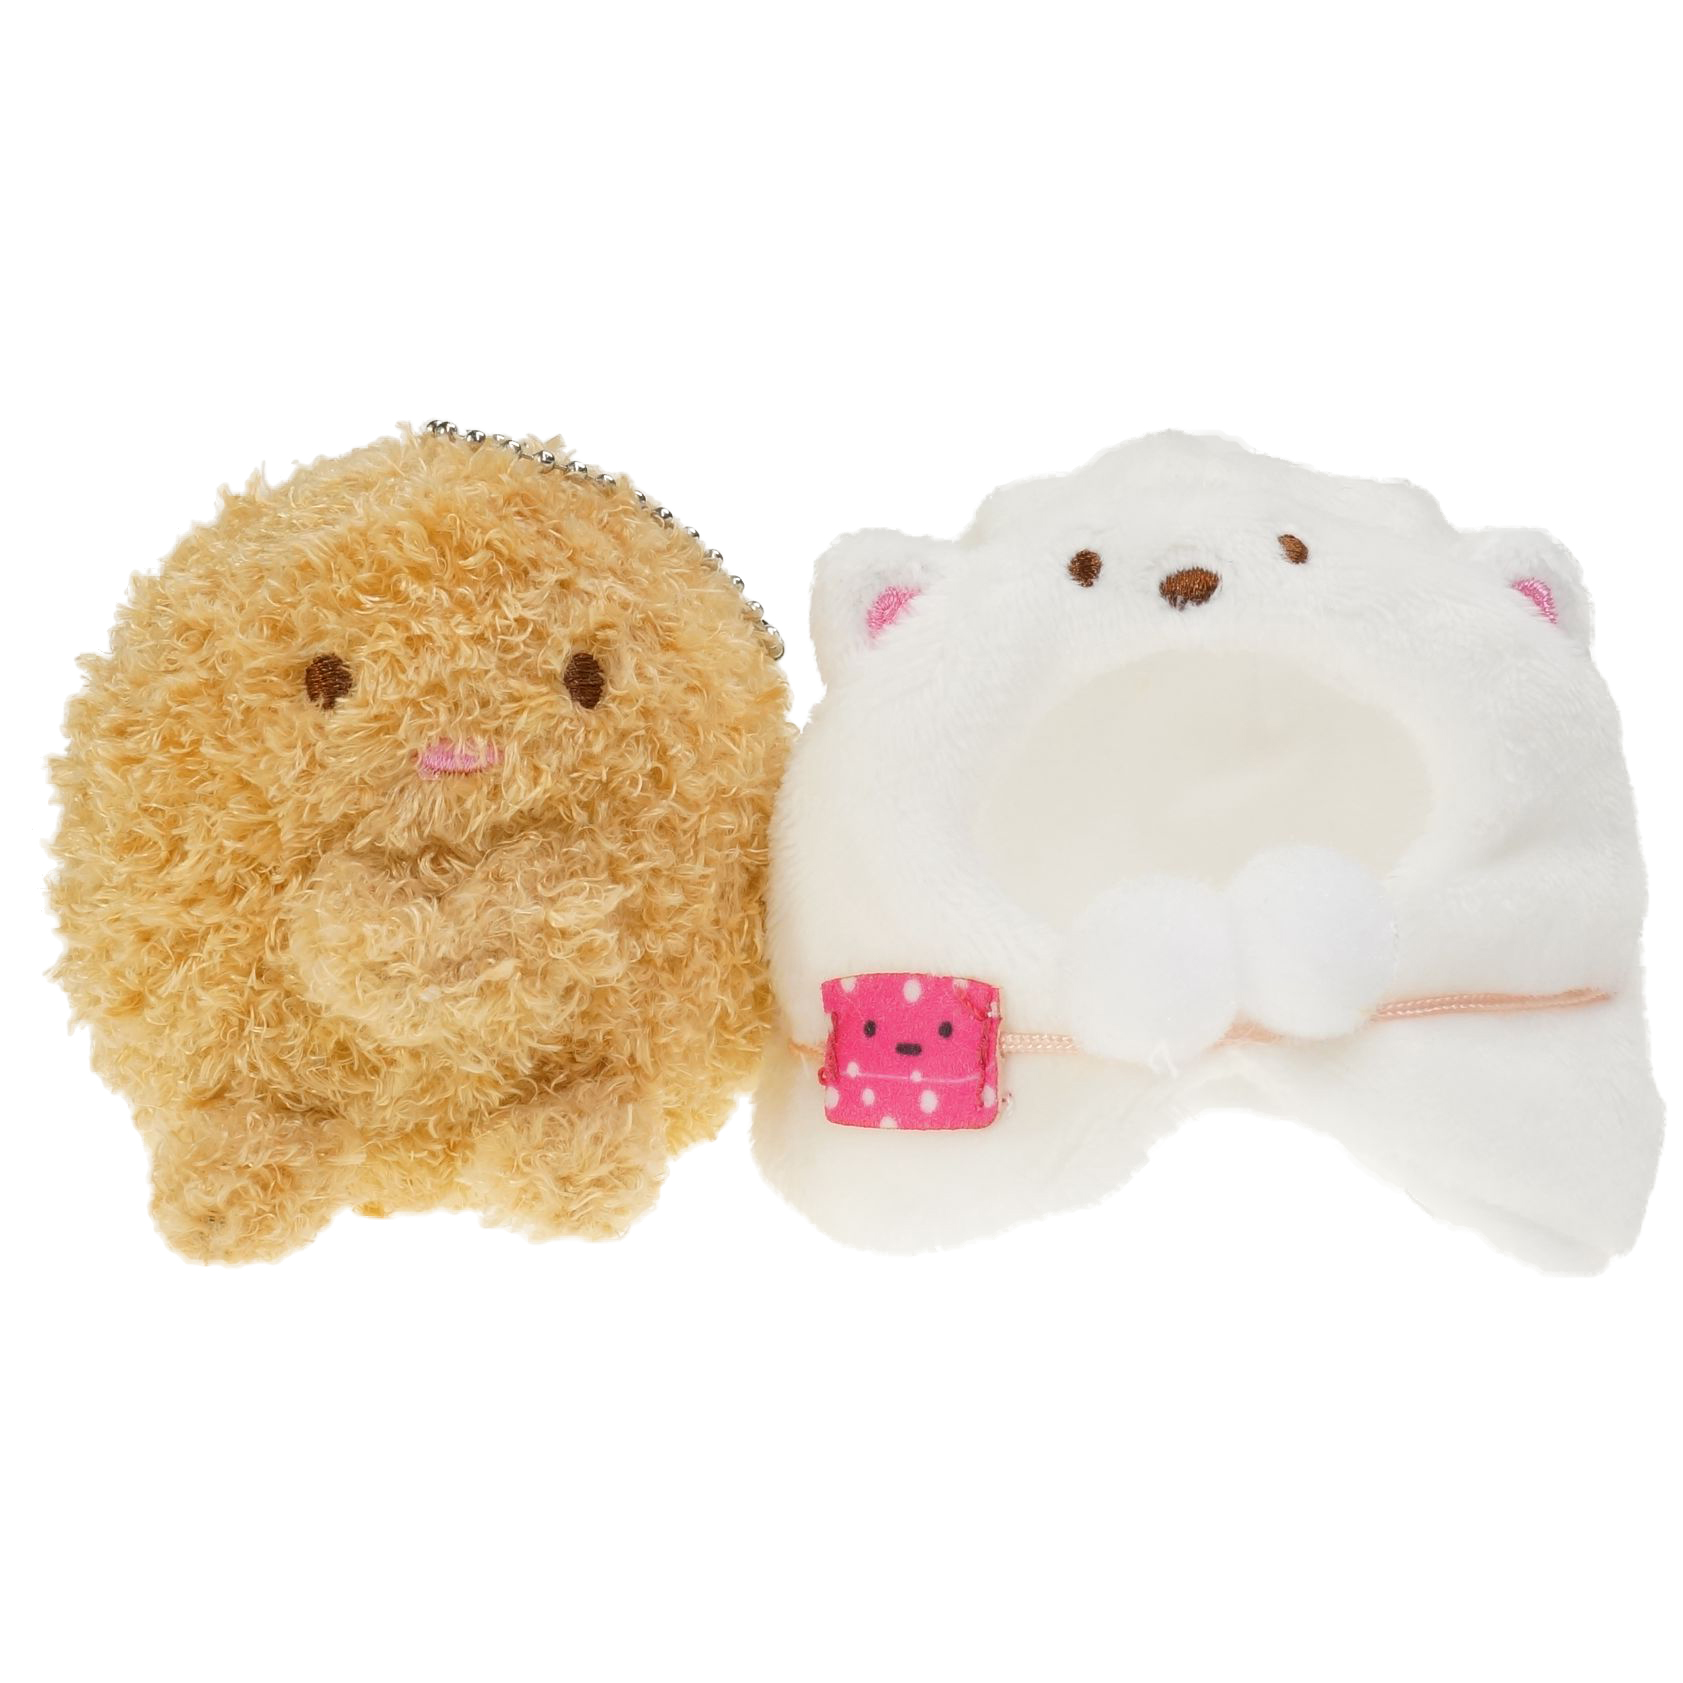 8 см игра sumikko sumikkourashi милые плюшевые игрушки